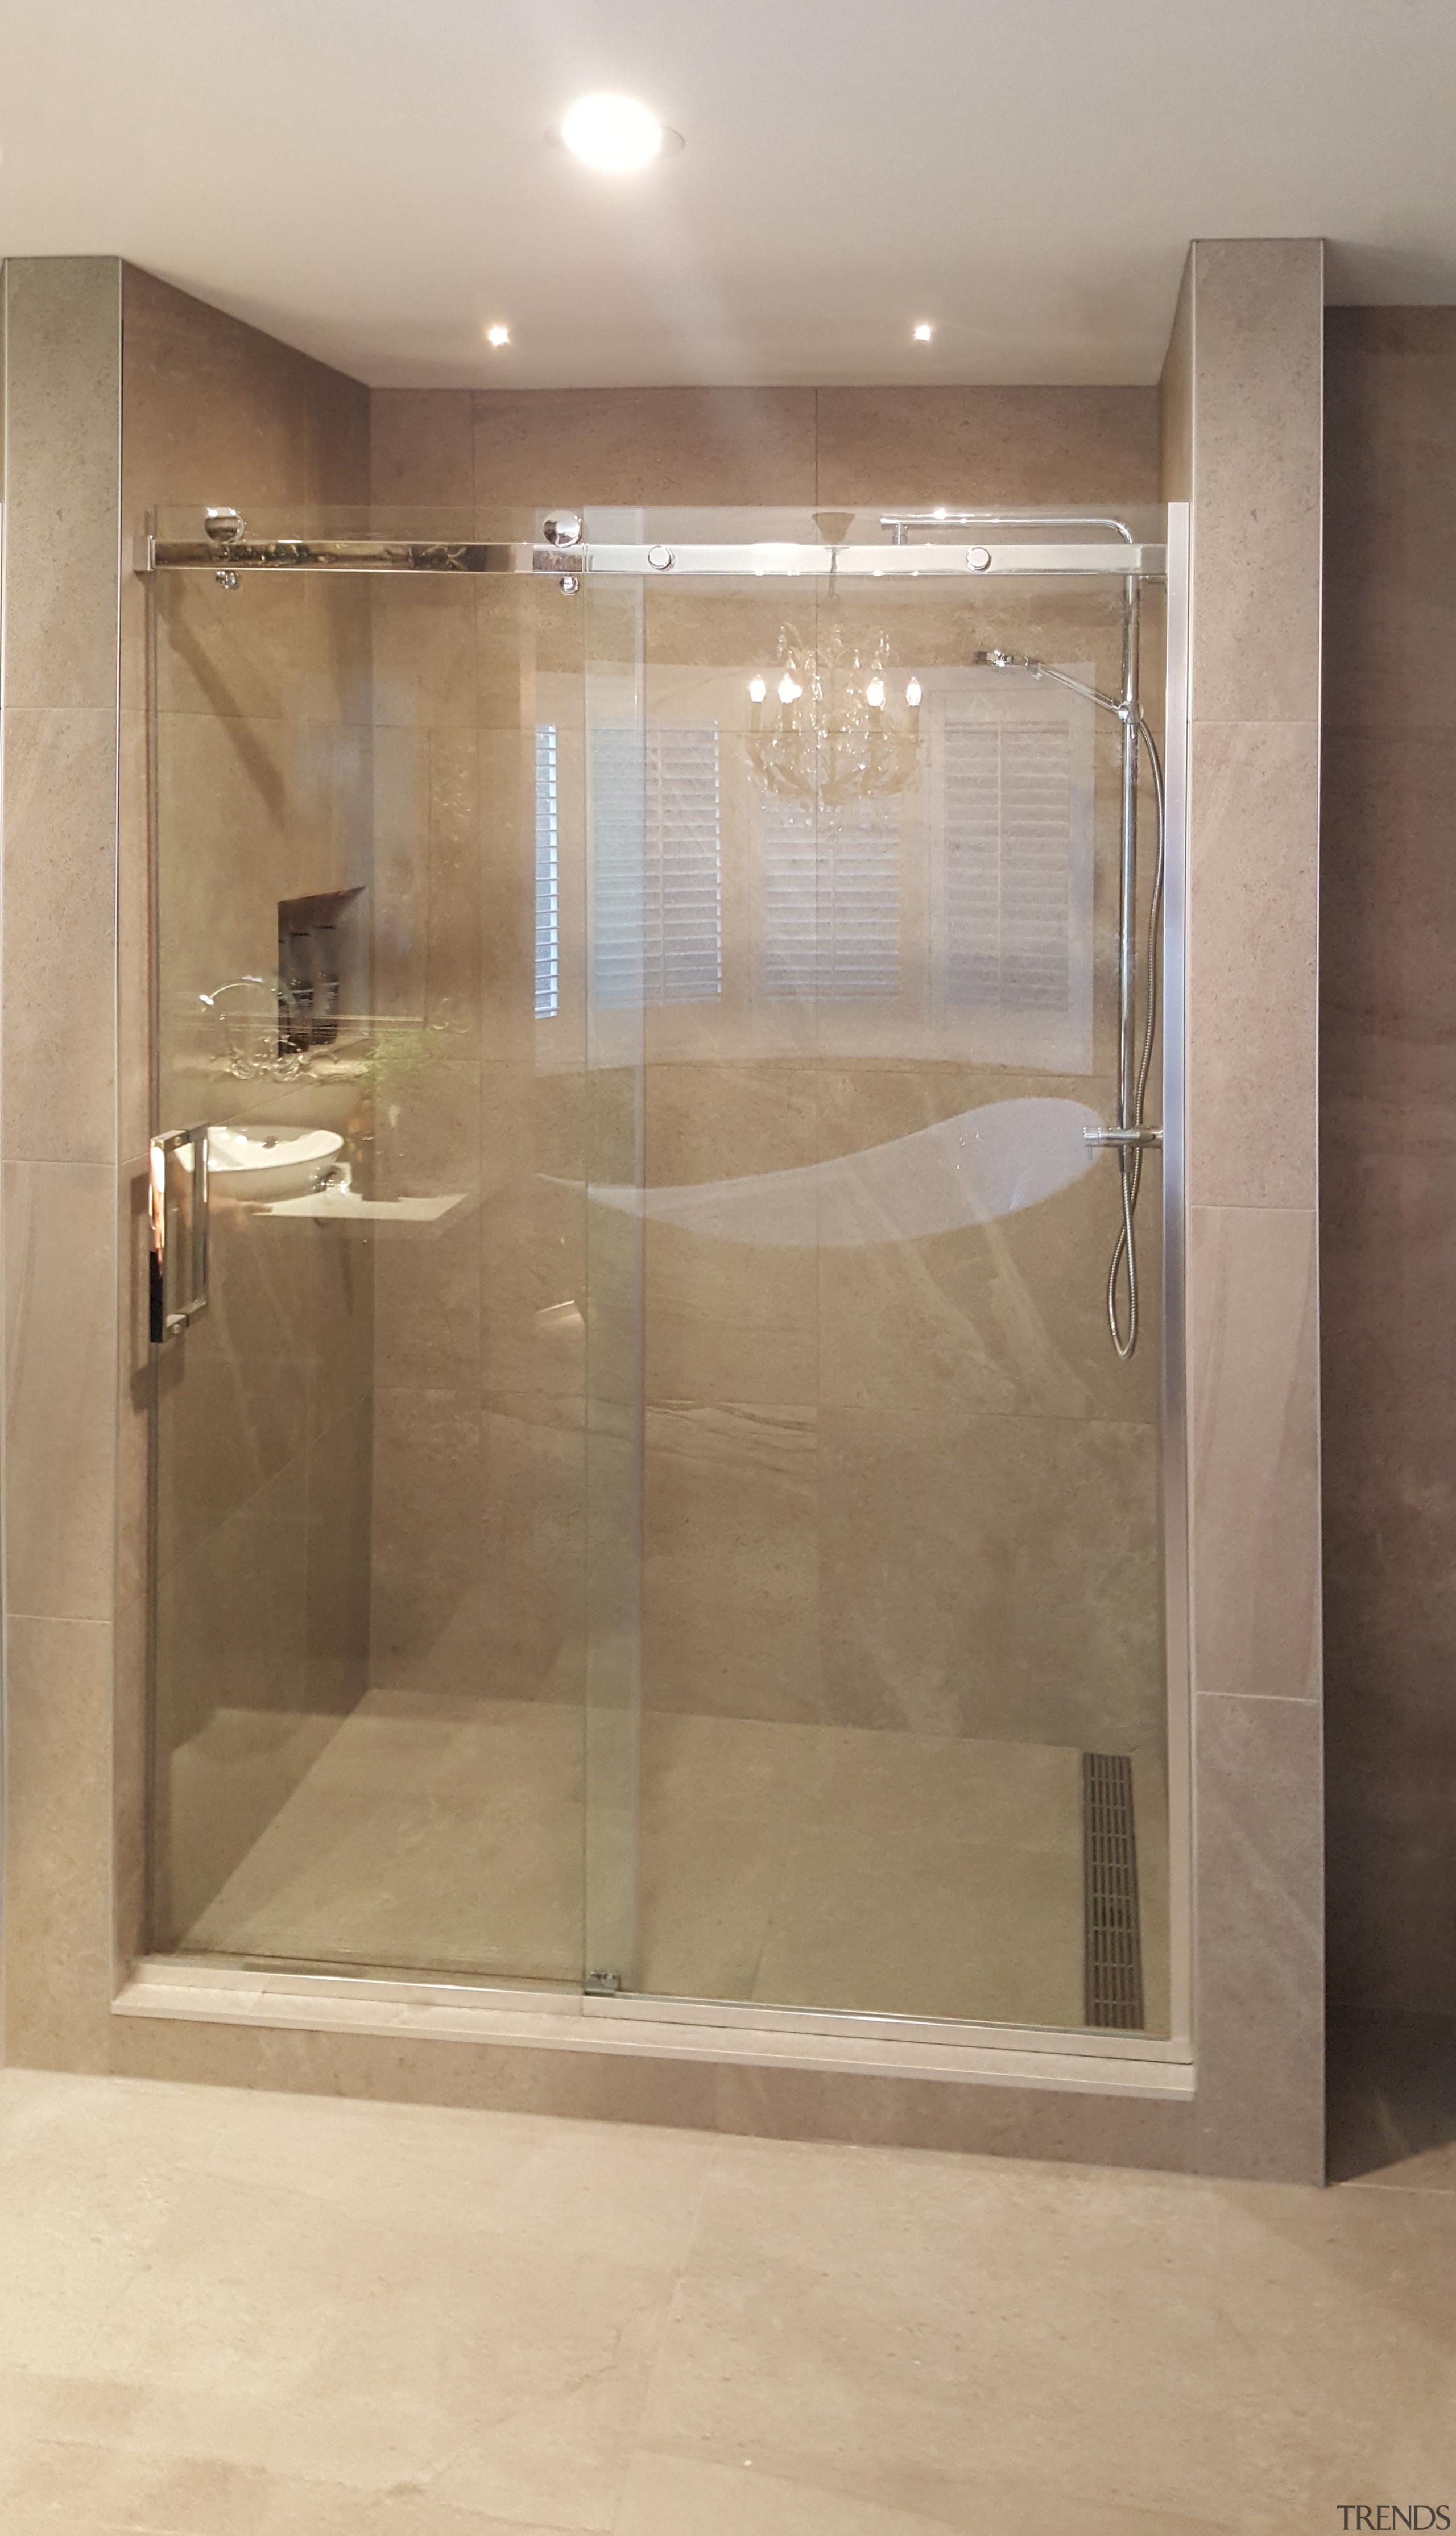 This shower by Five Star Bathrooms has bathroom, plumbing fixture, shower, brown, gray